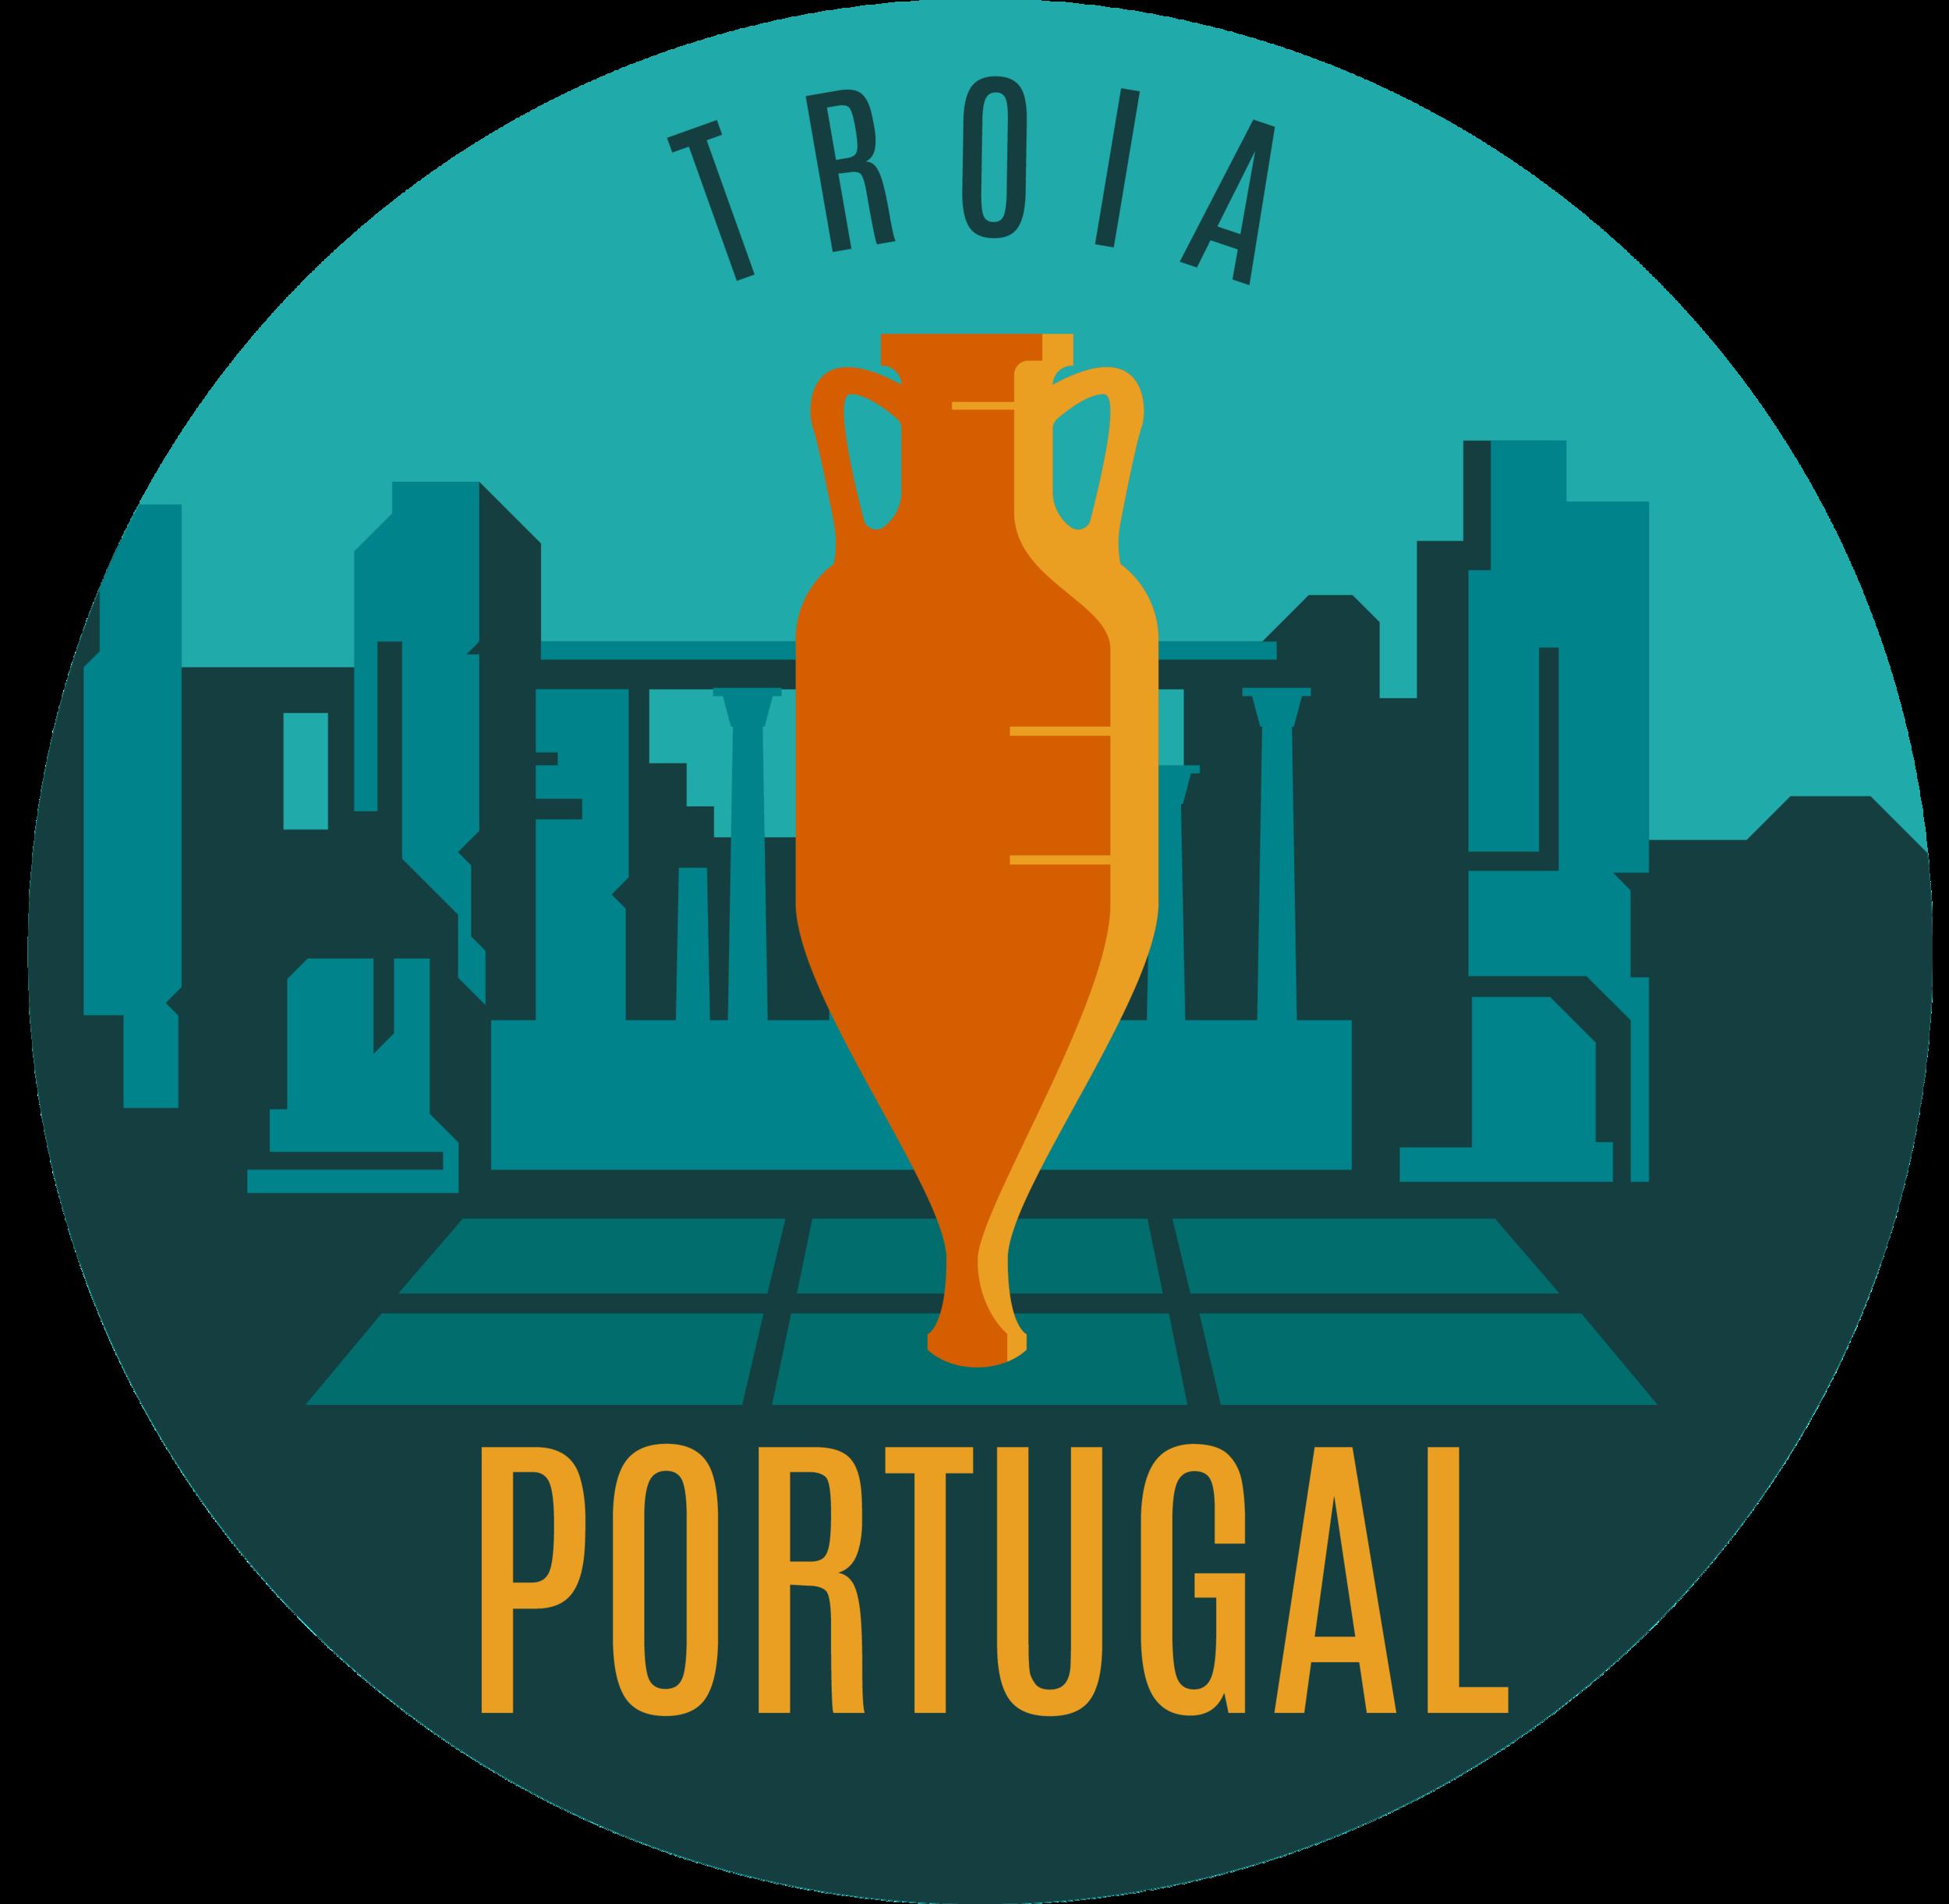 PortugalLogo.png